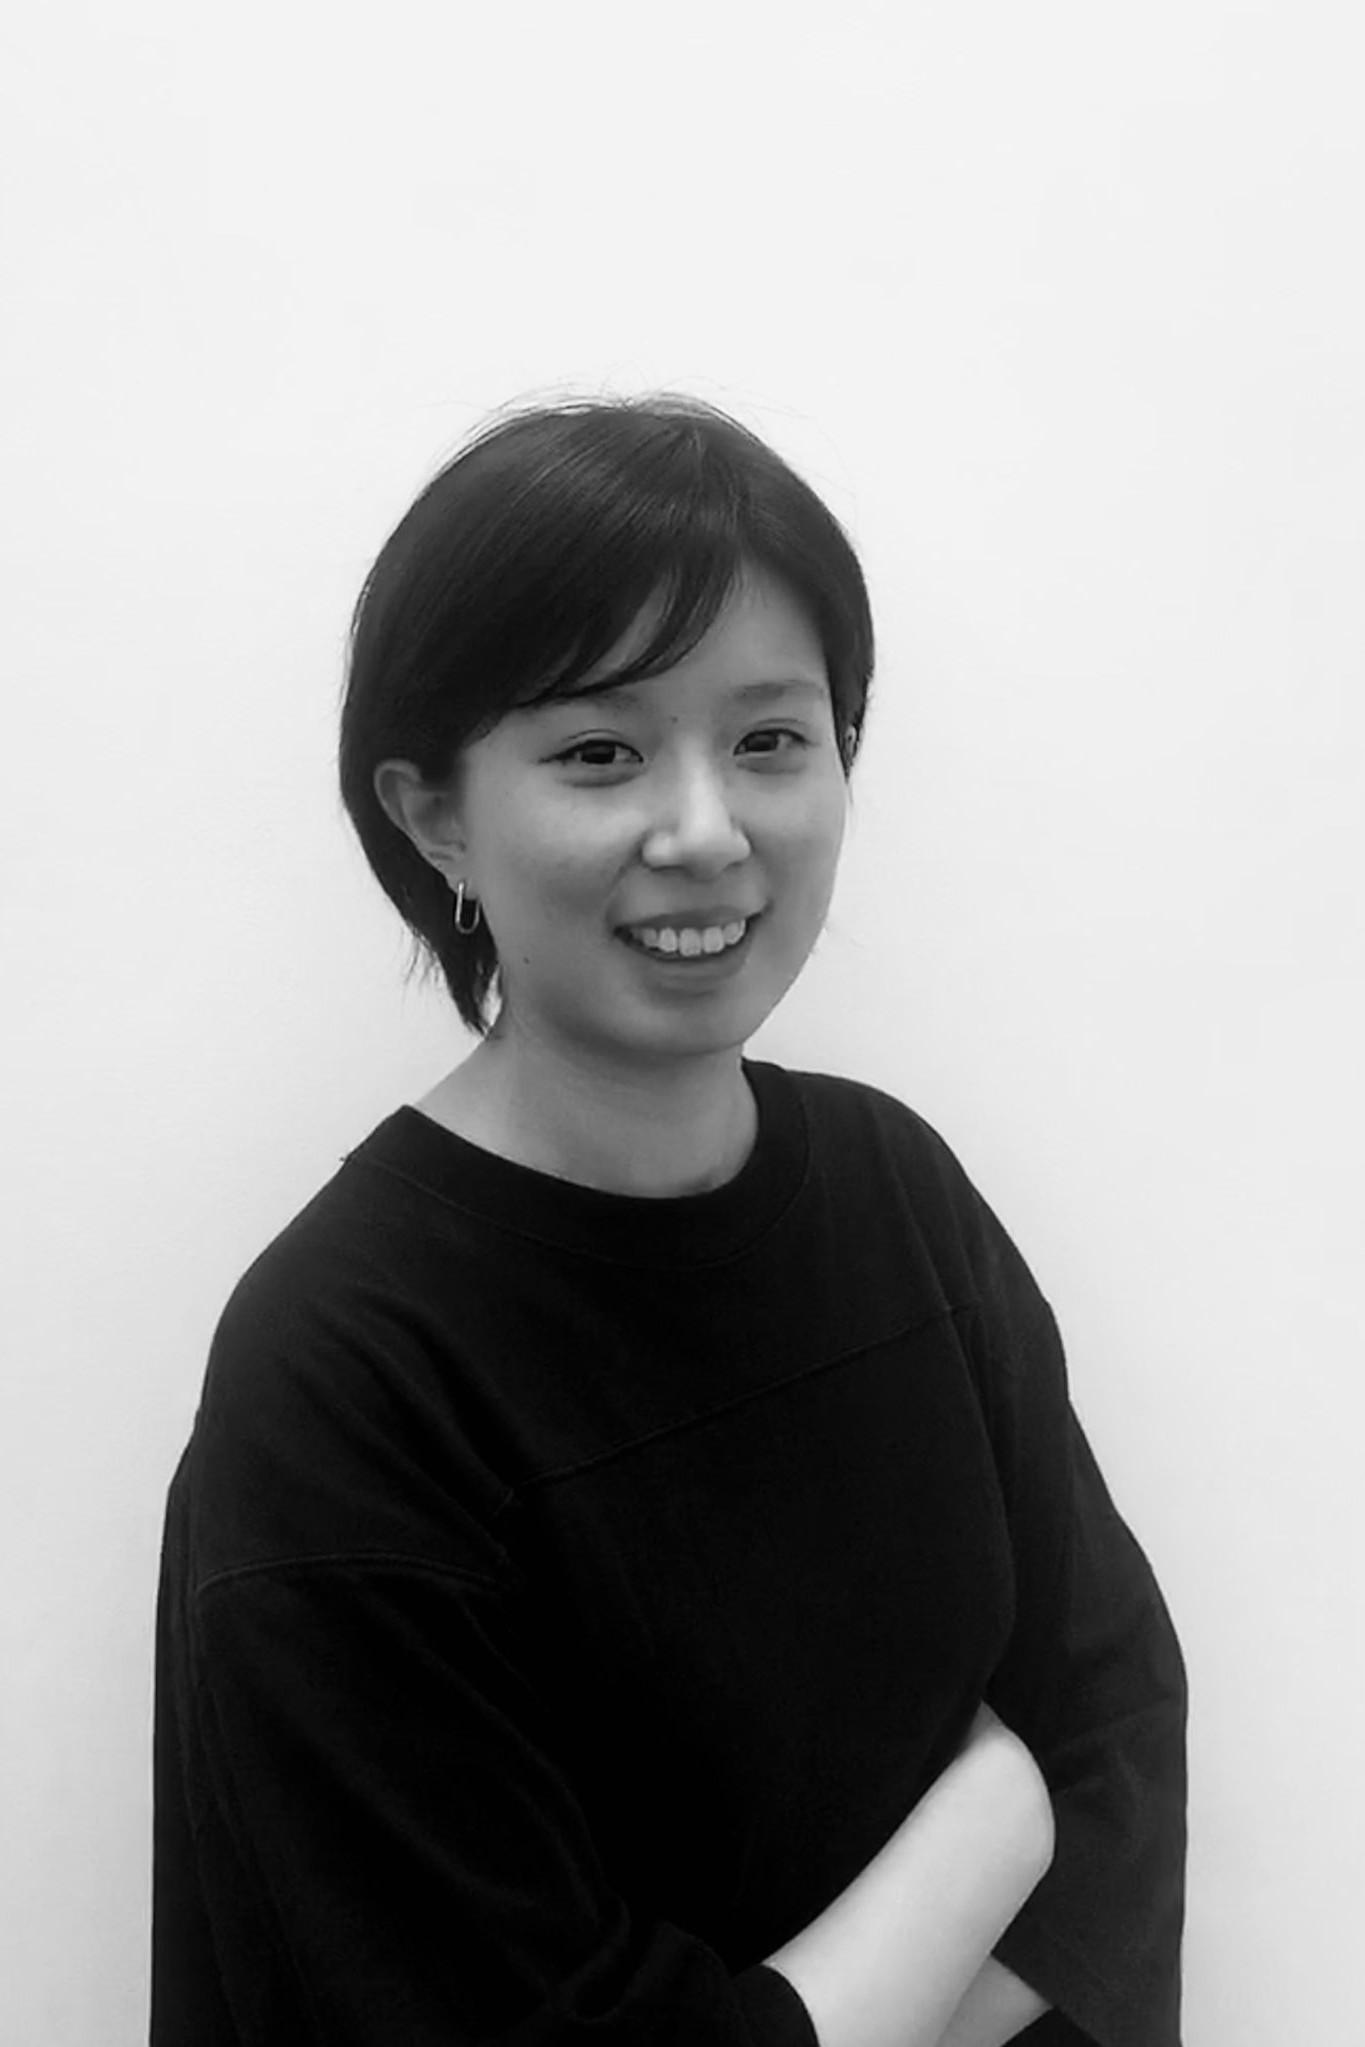 Jinxin Ma